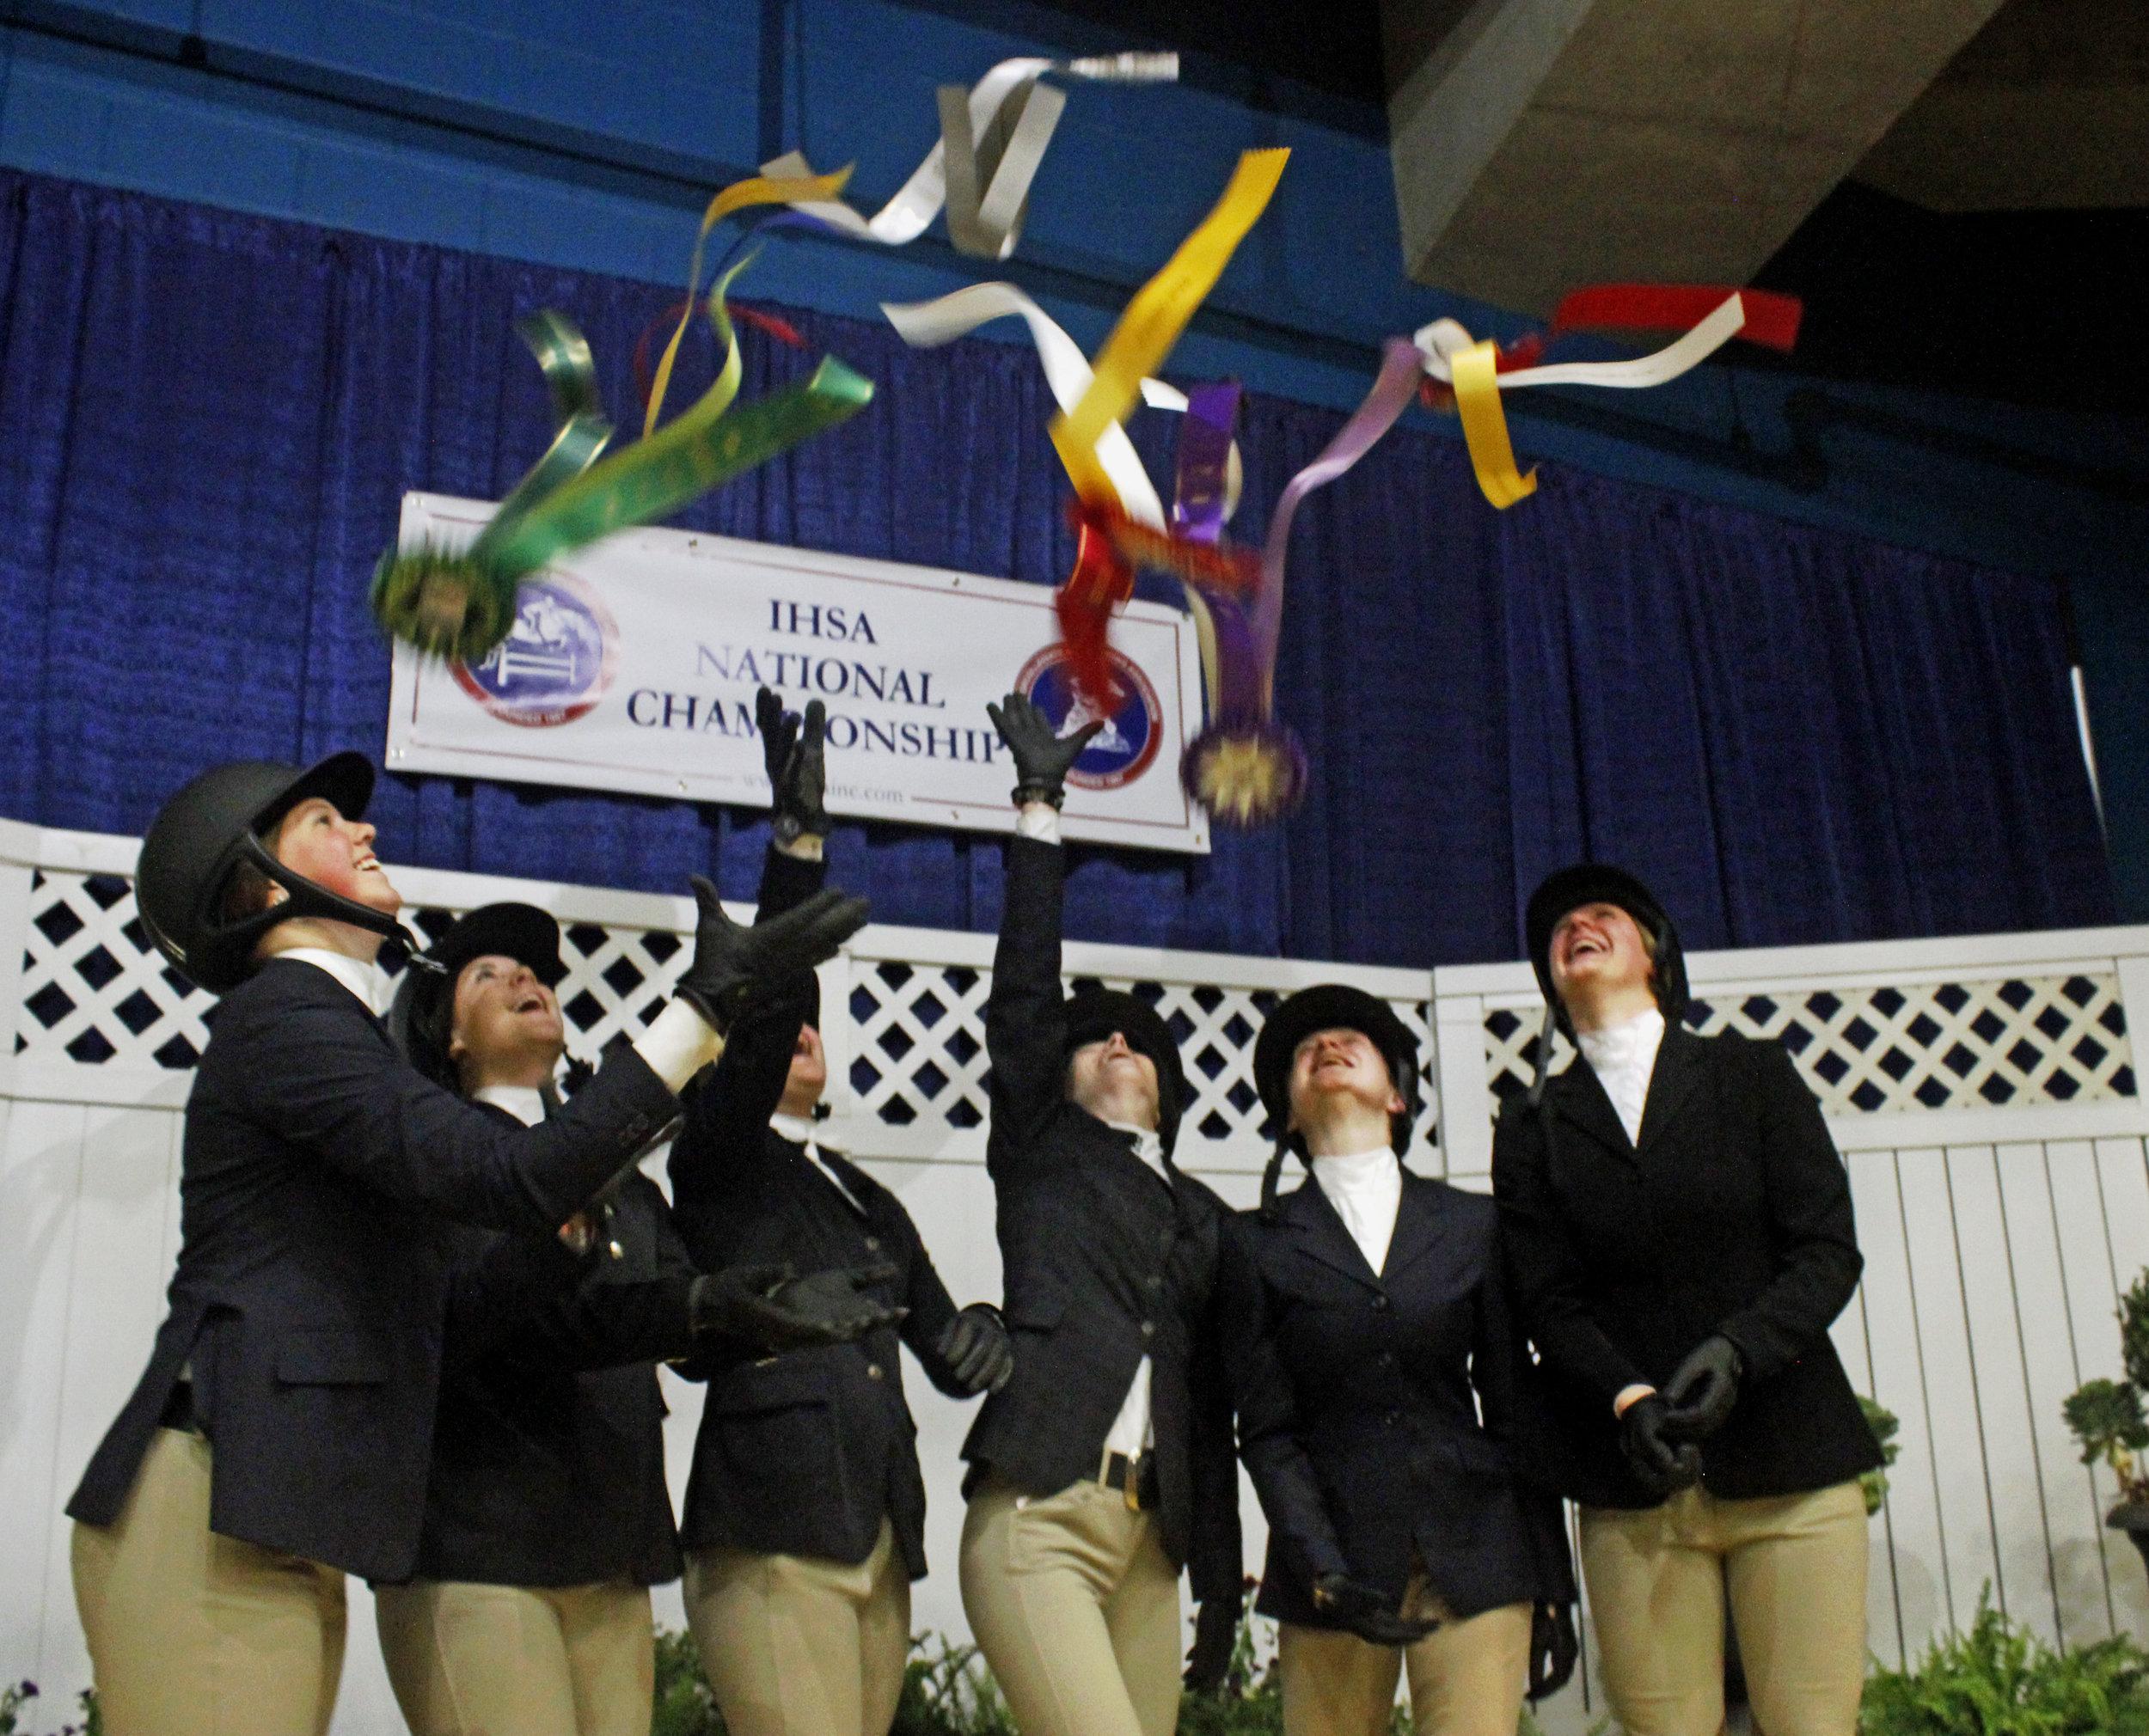 Hunter Seat riders celebrate at IHSA National Championship. Photo by Erin O'Neill.